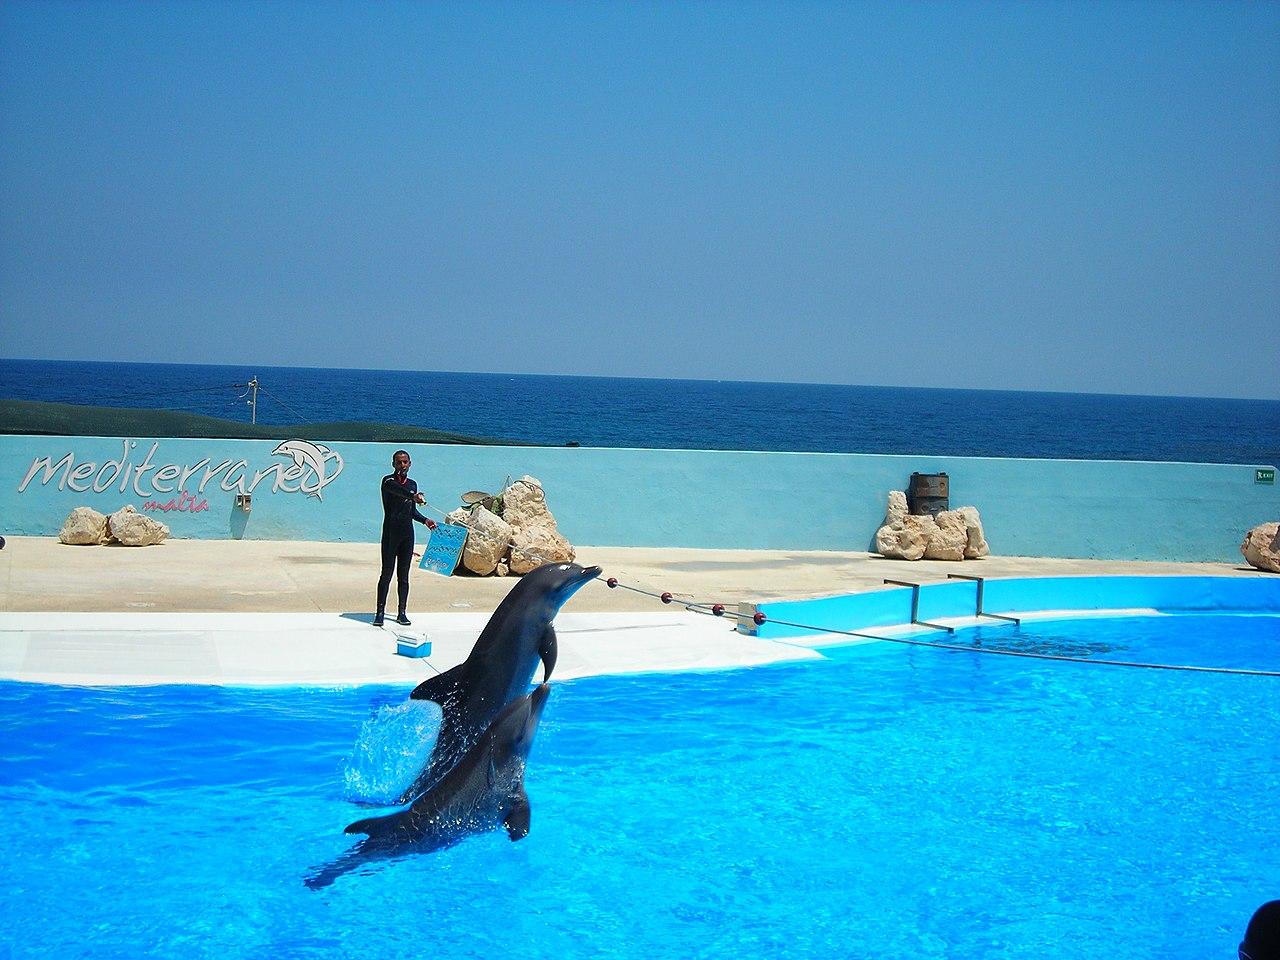 Malta  - Page 2 1280px-Mediterraneo_dolphin_show_1